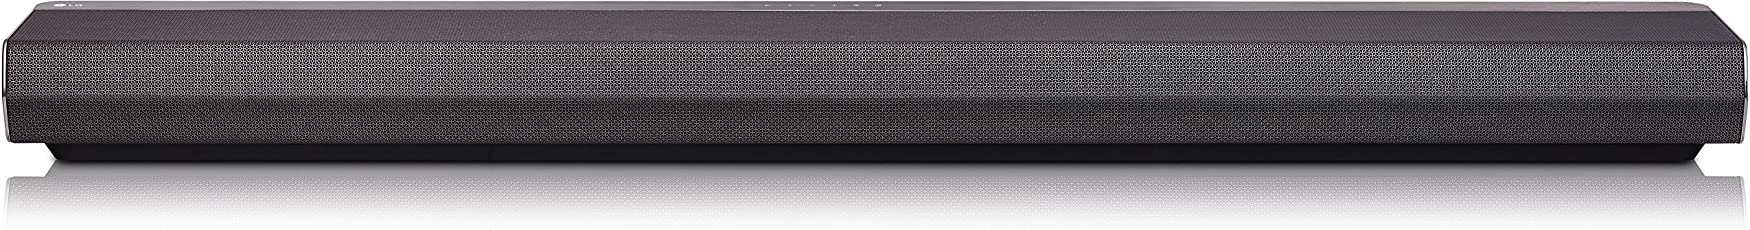 LG DSH7 Soundbar 4.0 mit Bluetooth 150 Watt